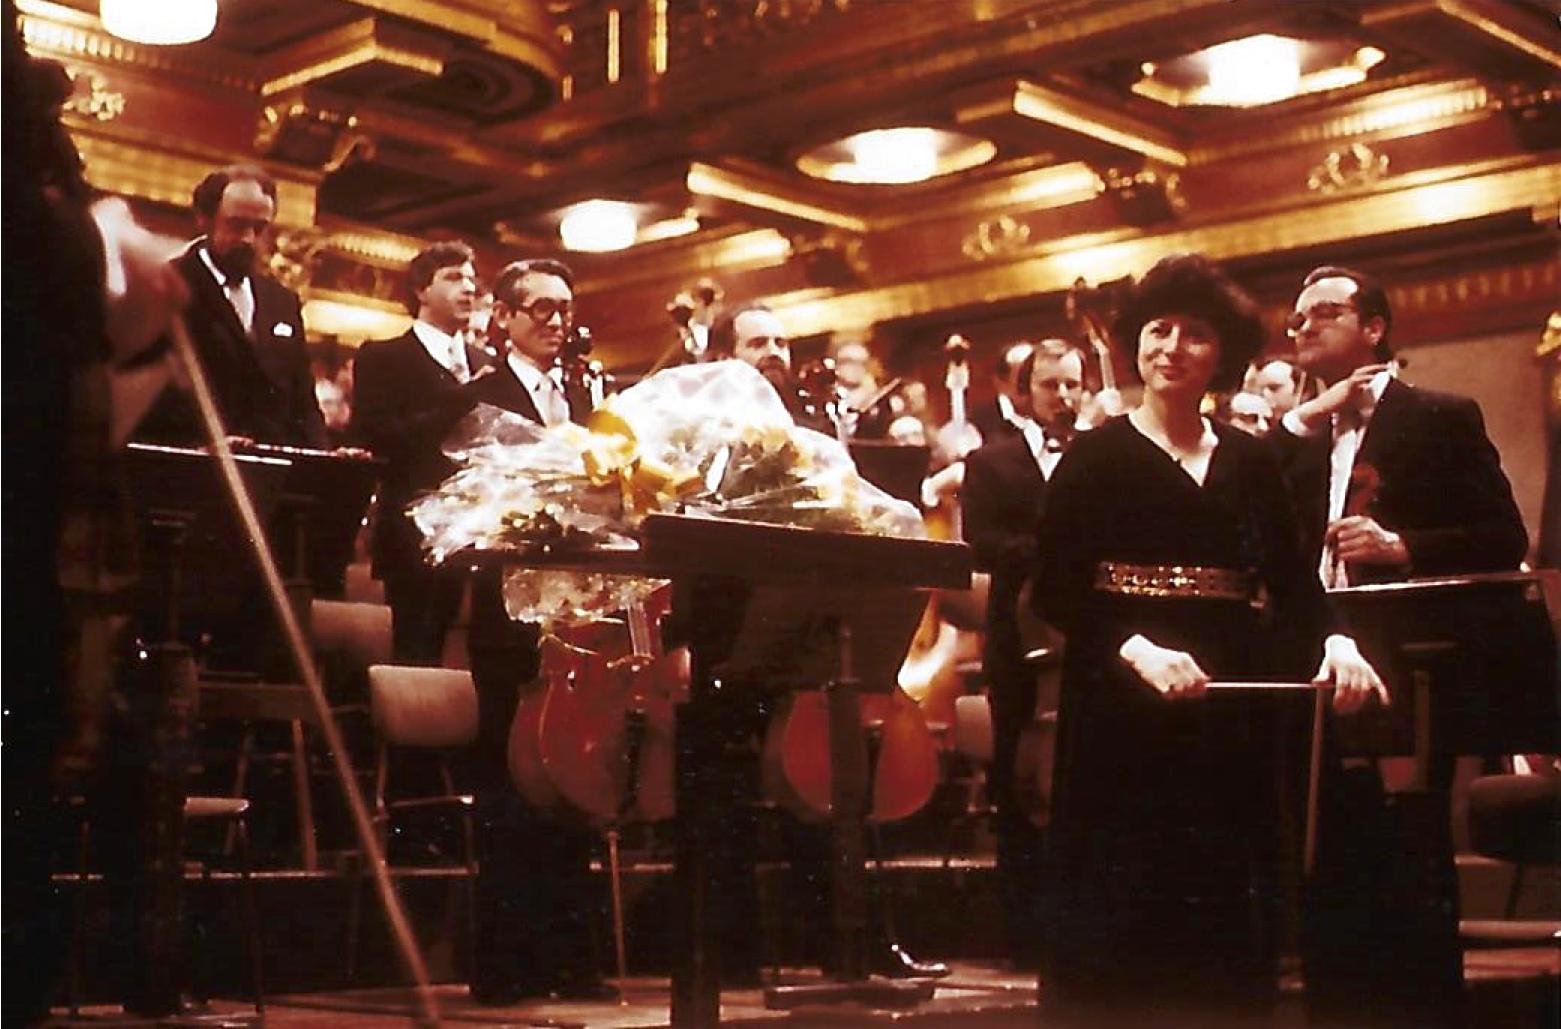 Tonkünstler Orchester at Musikvereinsaal, Vienna